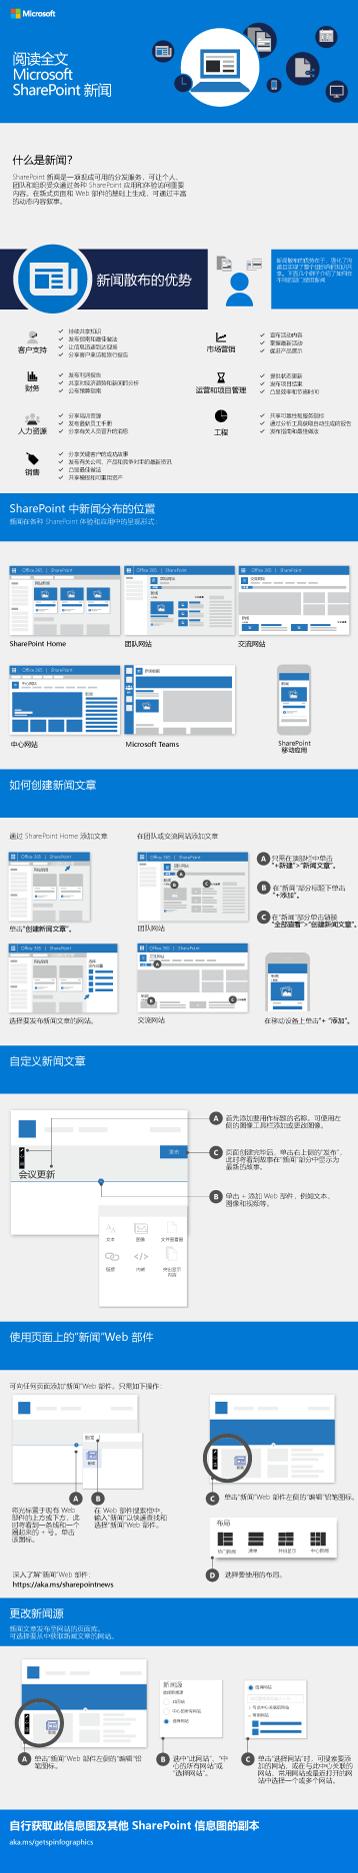 SharePoint 新闻信息图